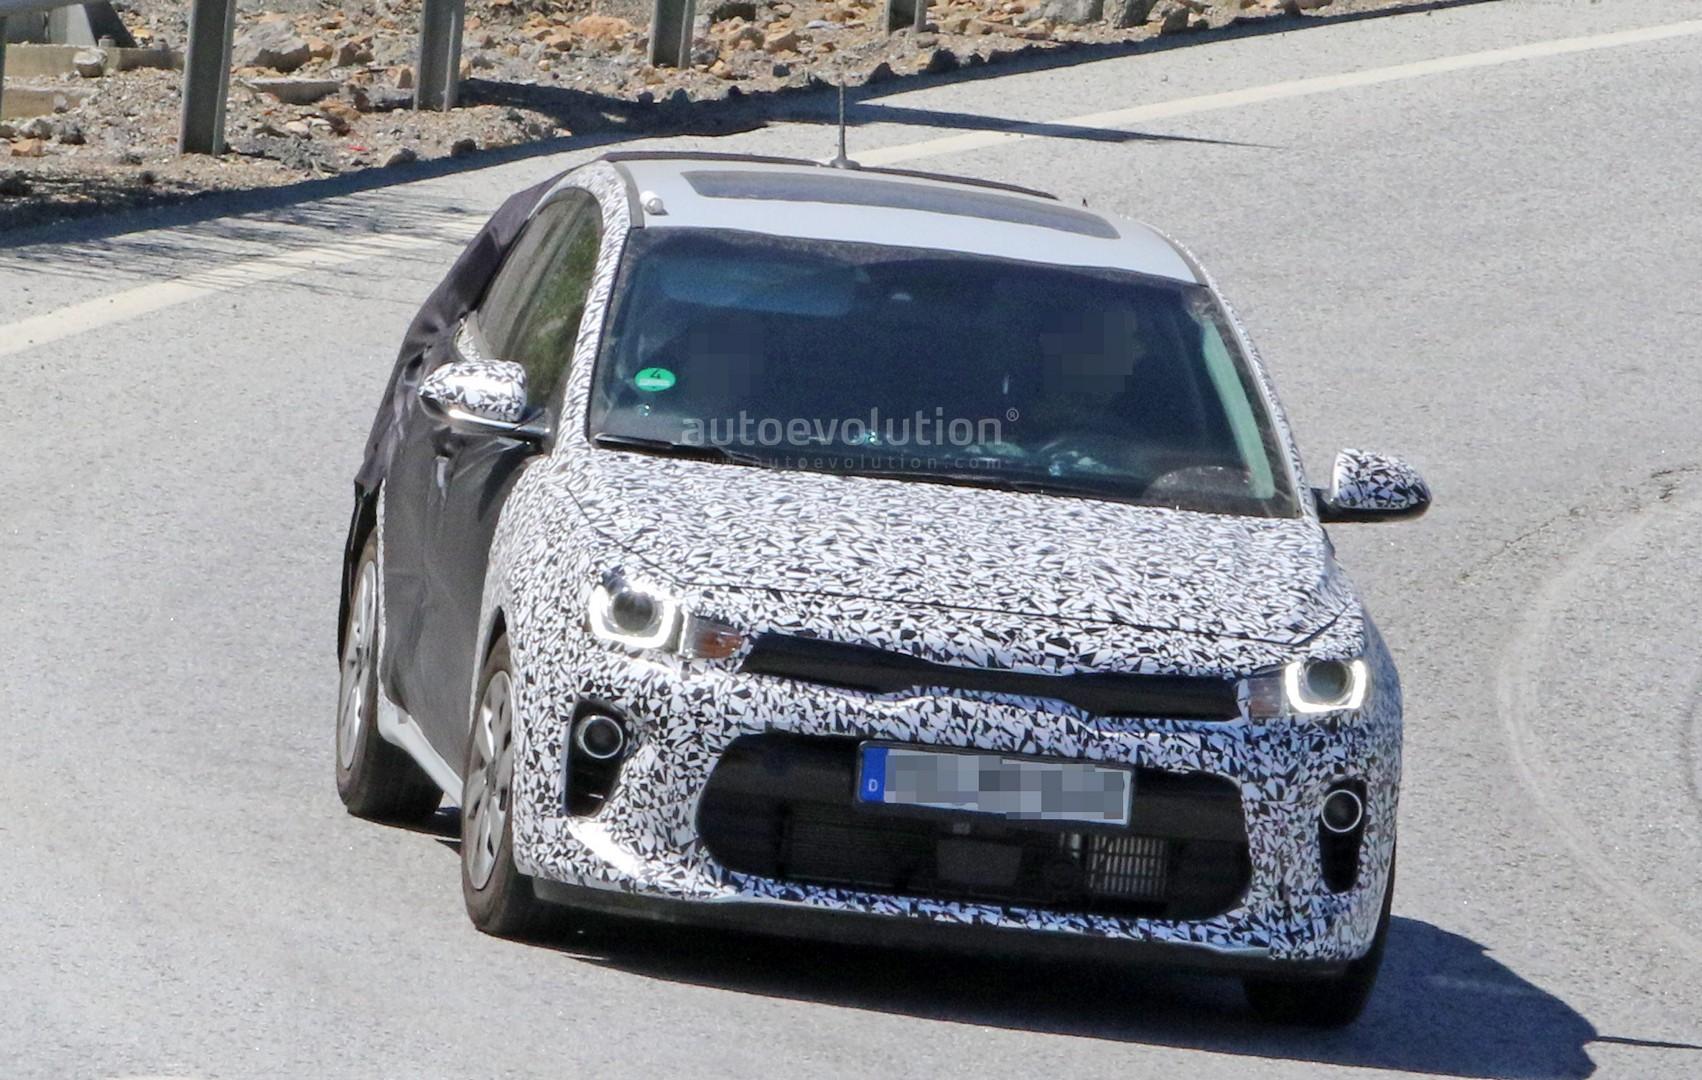 Paris Motor Show 2016: All-new Kia Rio to get debut